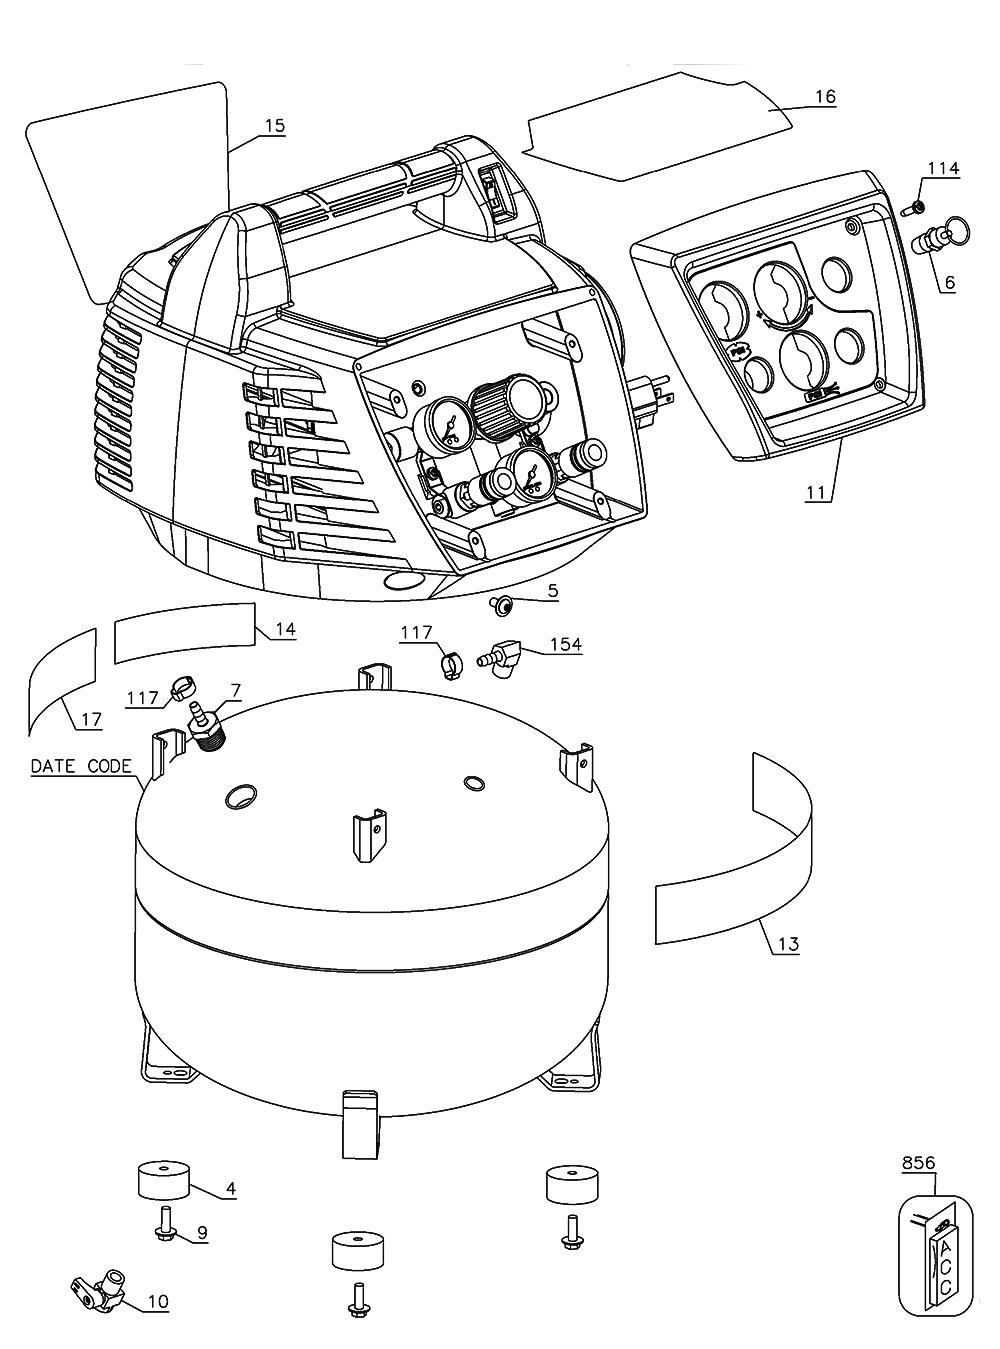 Gto Wiring Diagram For Ignition OnWiringWiring Diagrams Image - 1974 corvette ignition coil wiring diagram